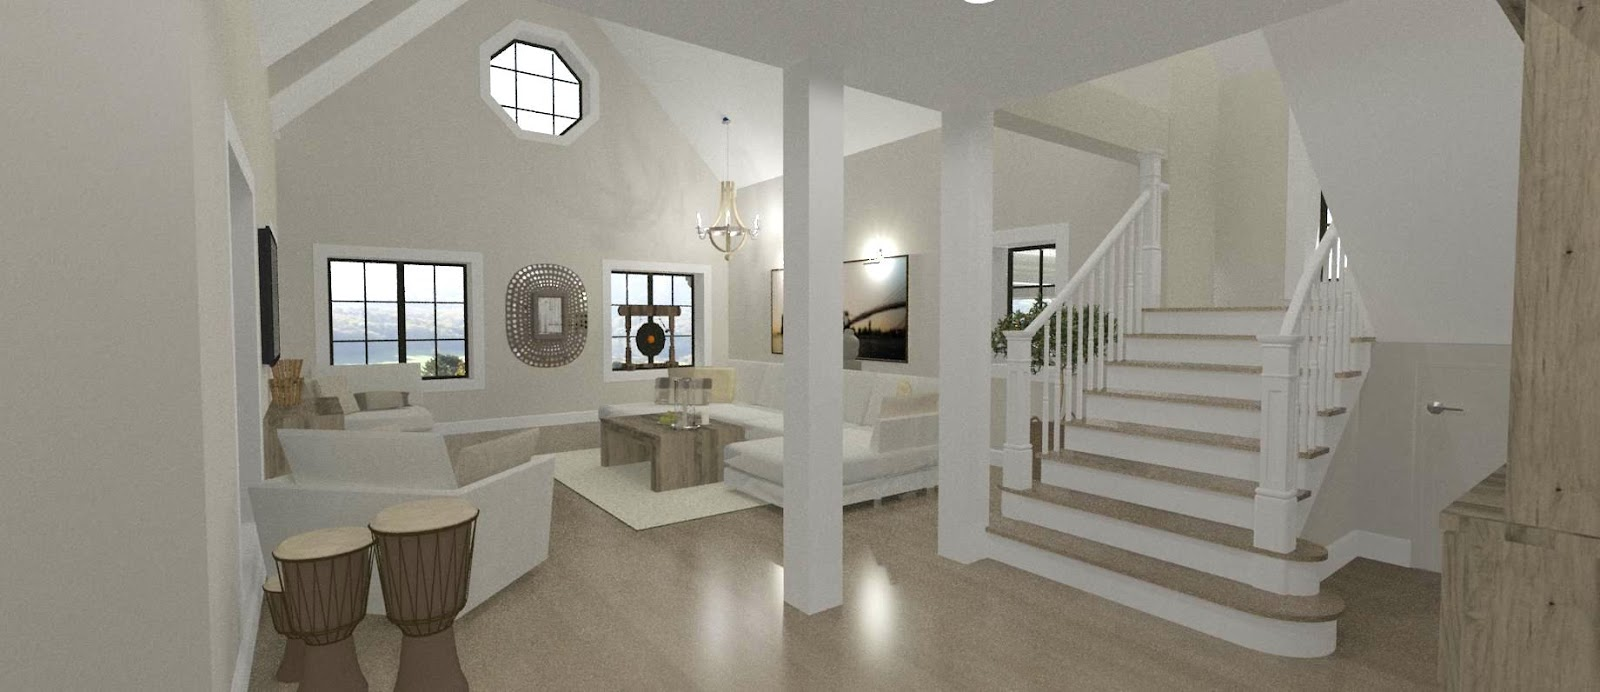 3d visualisierung beachhouse living. Black Bedroom Furniture Sets. Home Design Ideas